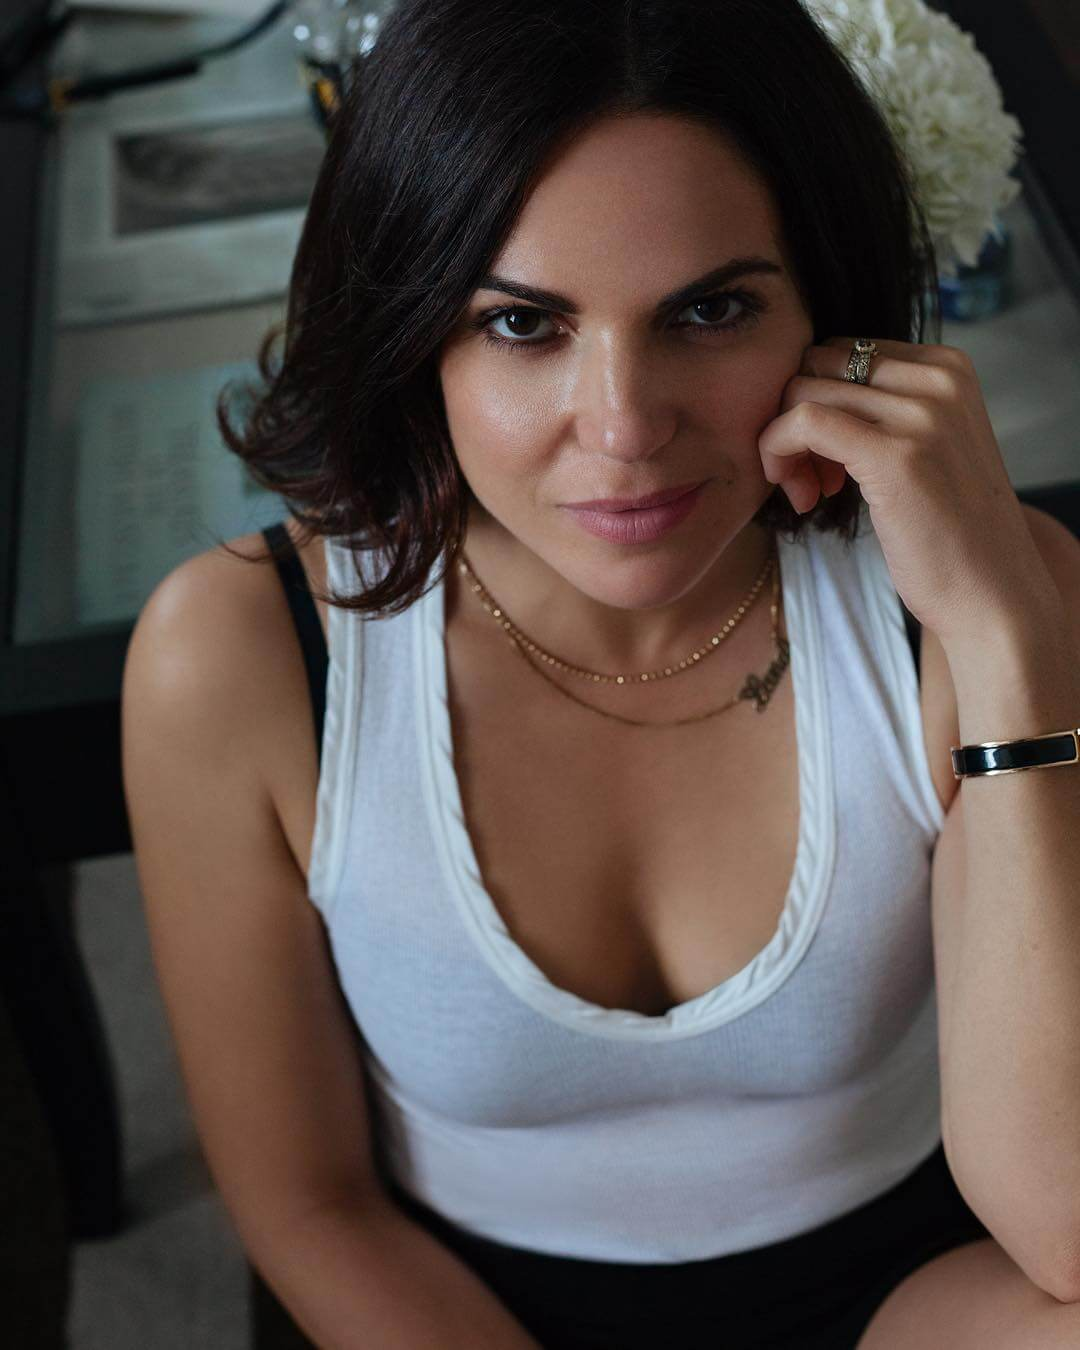 50 Hot And Sexy Lana Parrilla Photos - 12thBlog